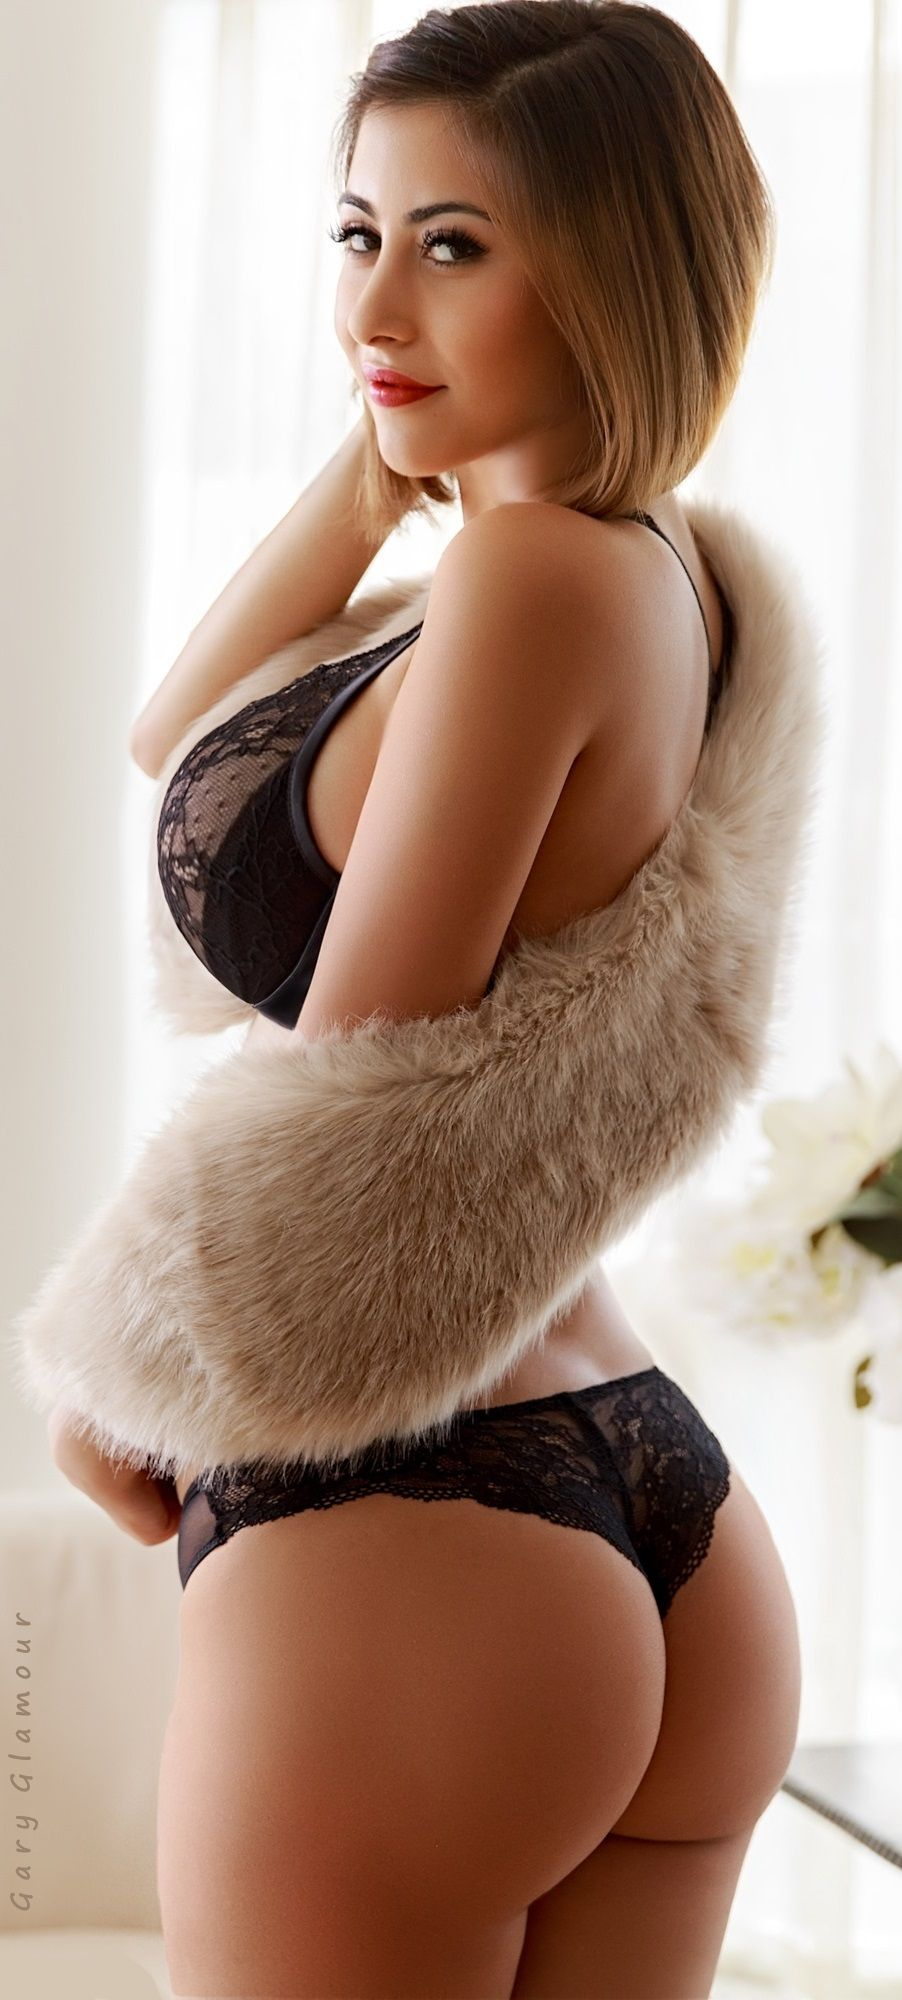 Katyuska moonfox psylocke,Anjela nedyalkova topless Erotic clip Sabine Jemeljanova topless,Vs angel lais ribeiro wears 2 million champagne nights fantasy bra